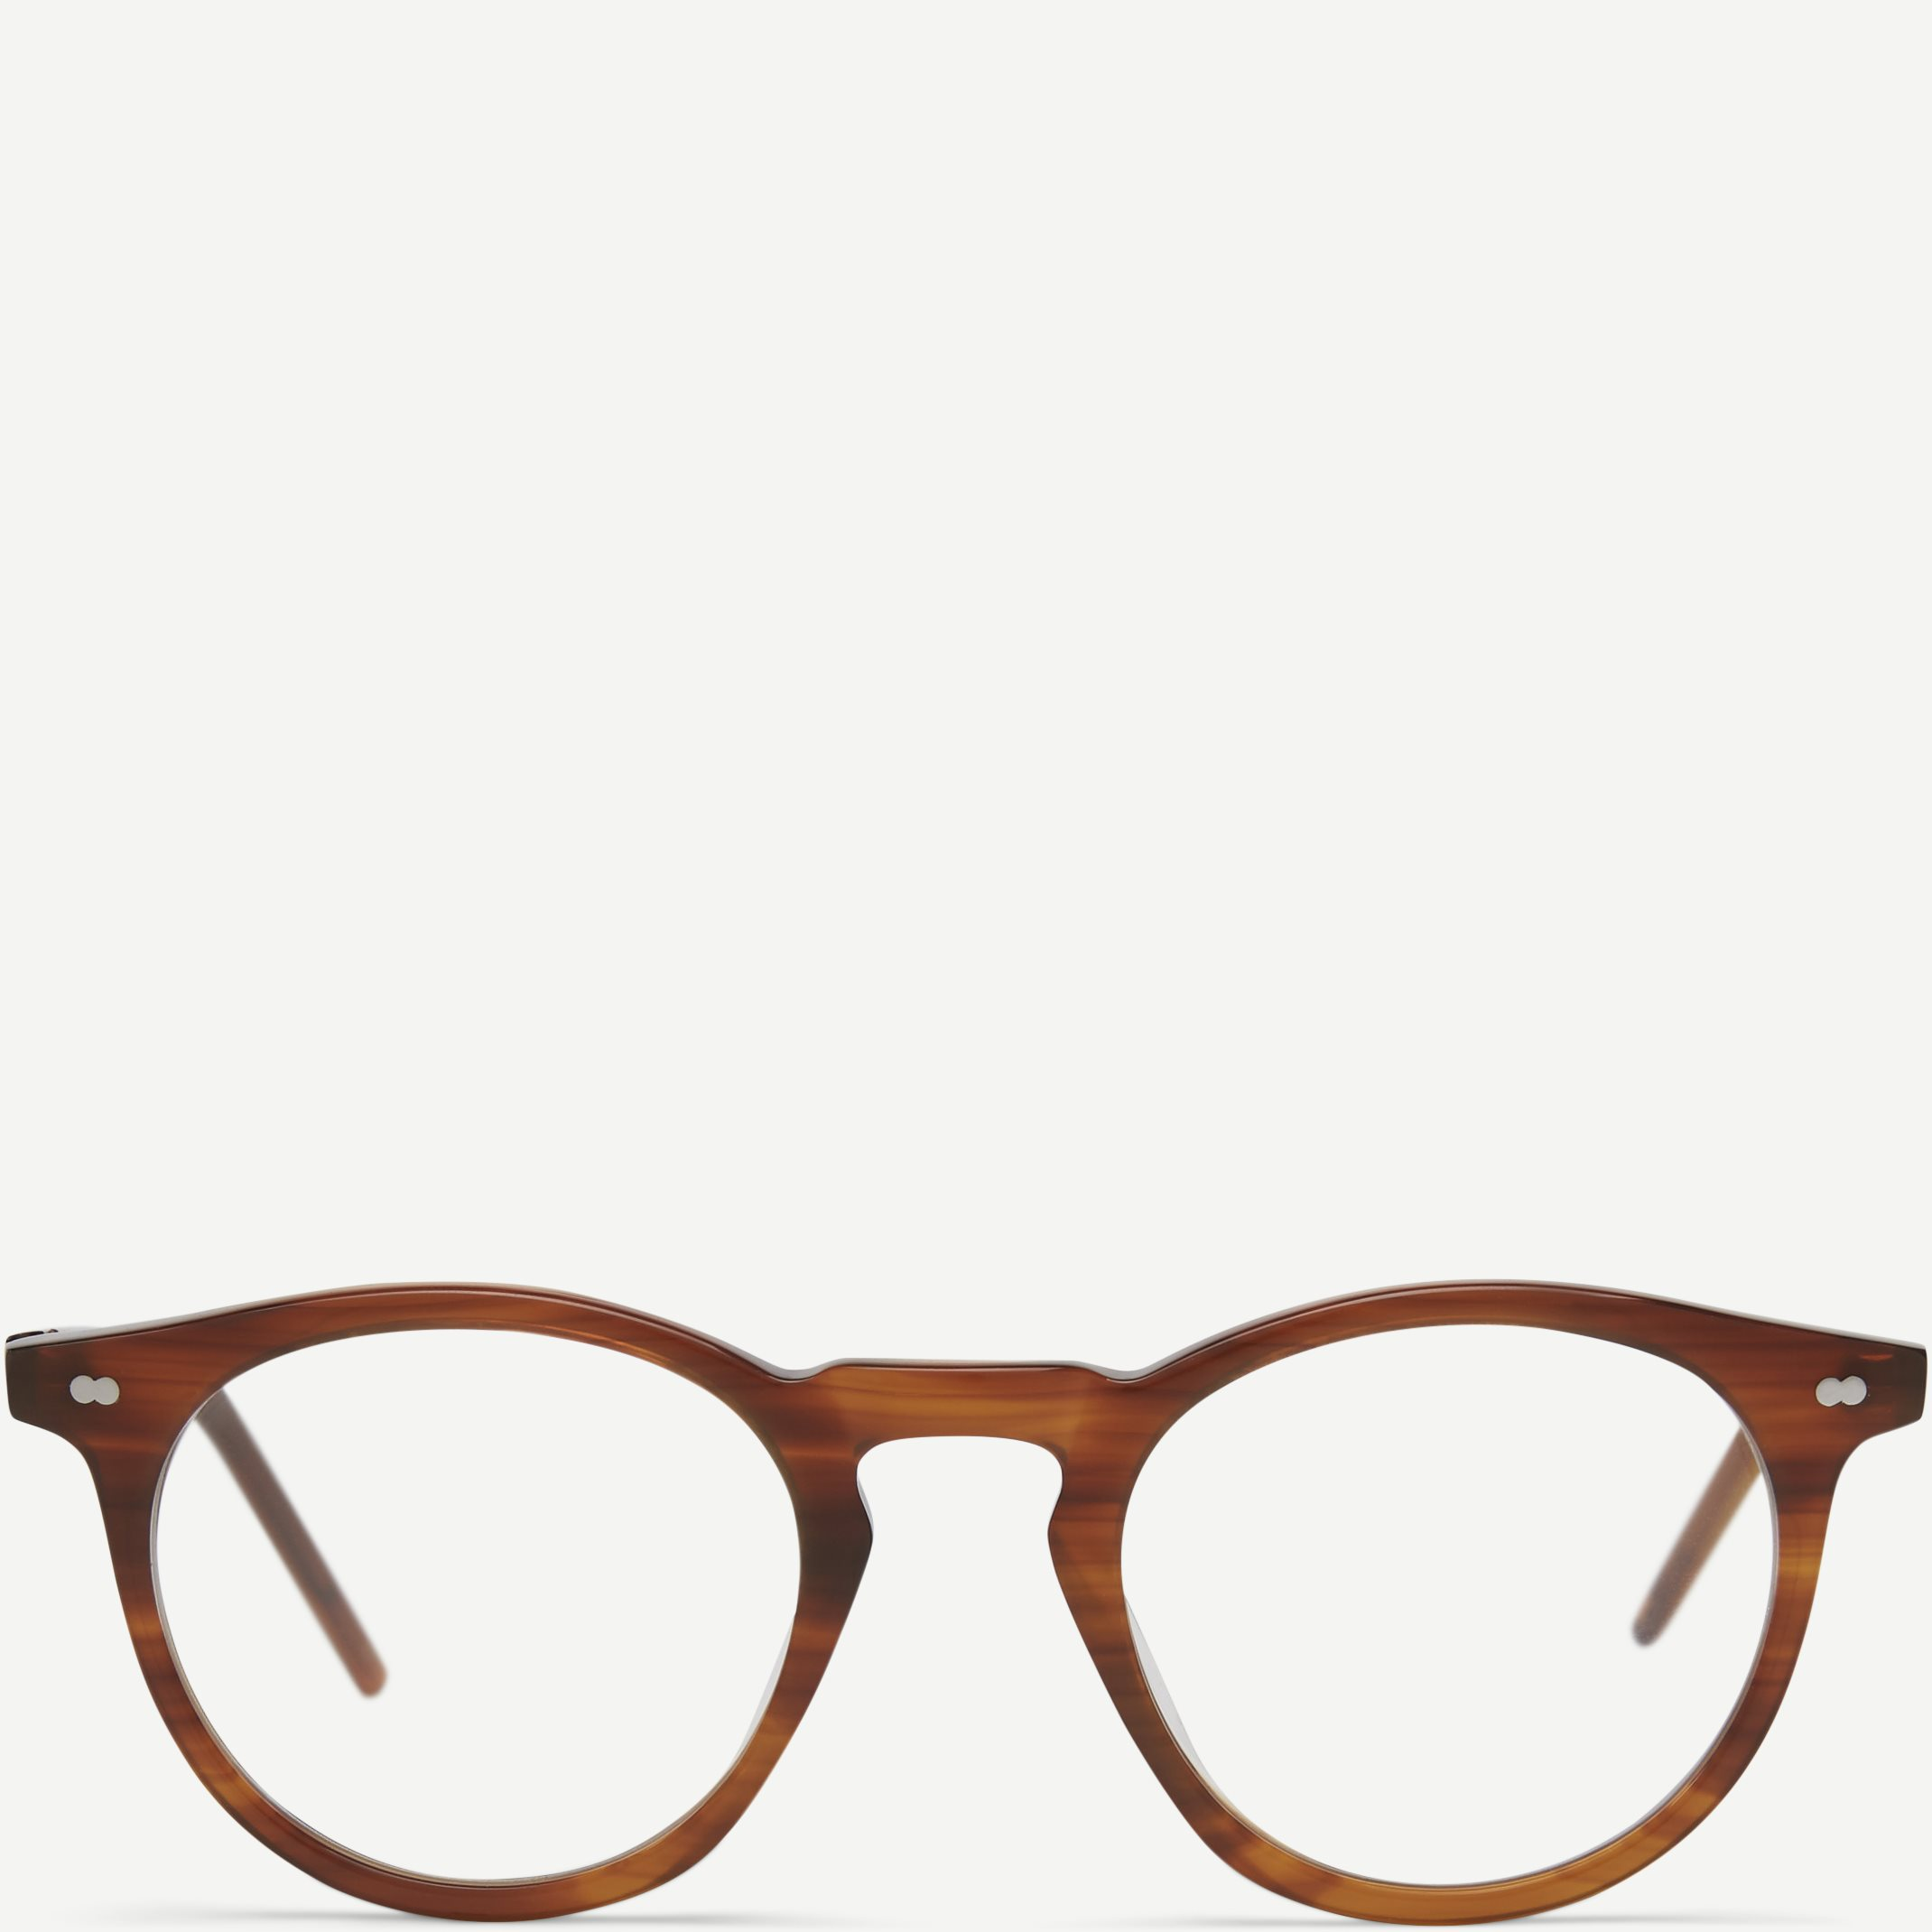 Paloma Blue Light Briller - Accessories - Brun